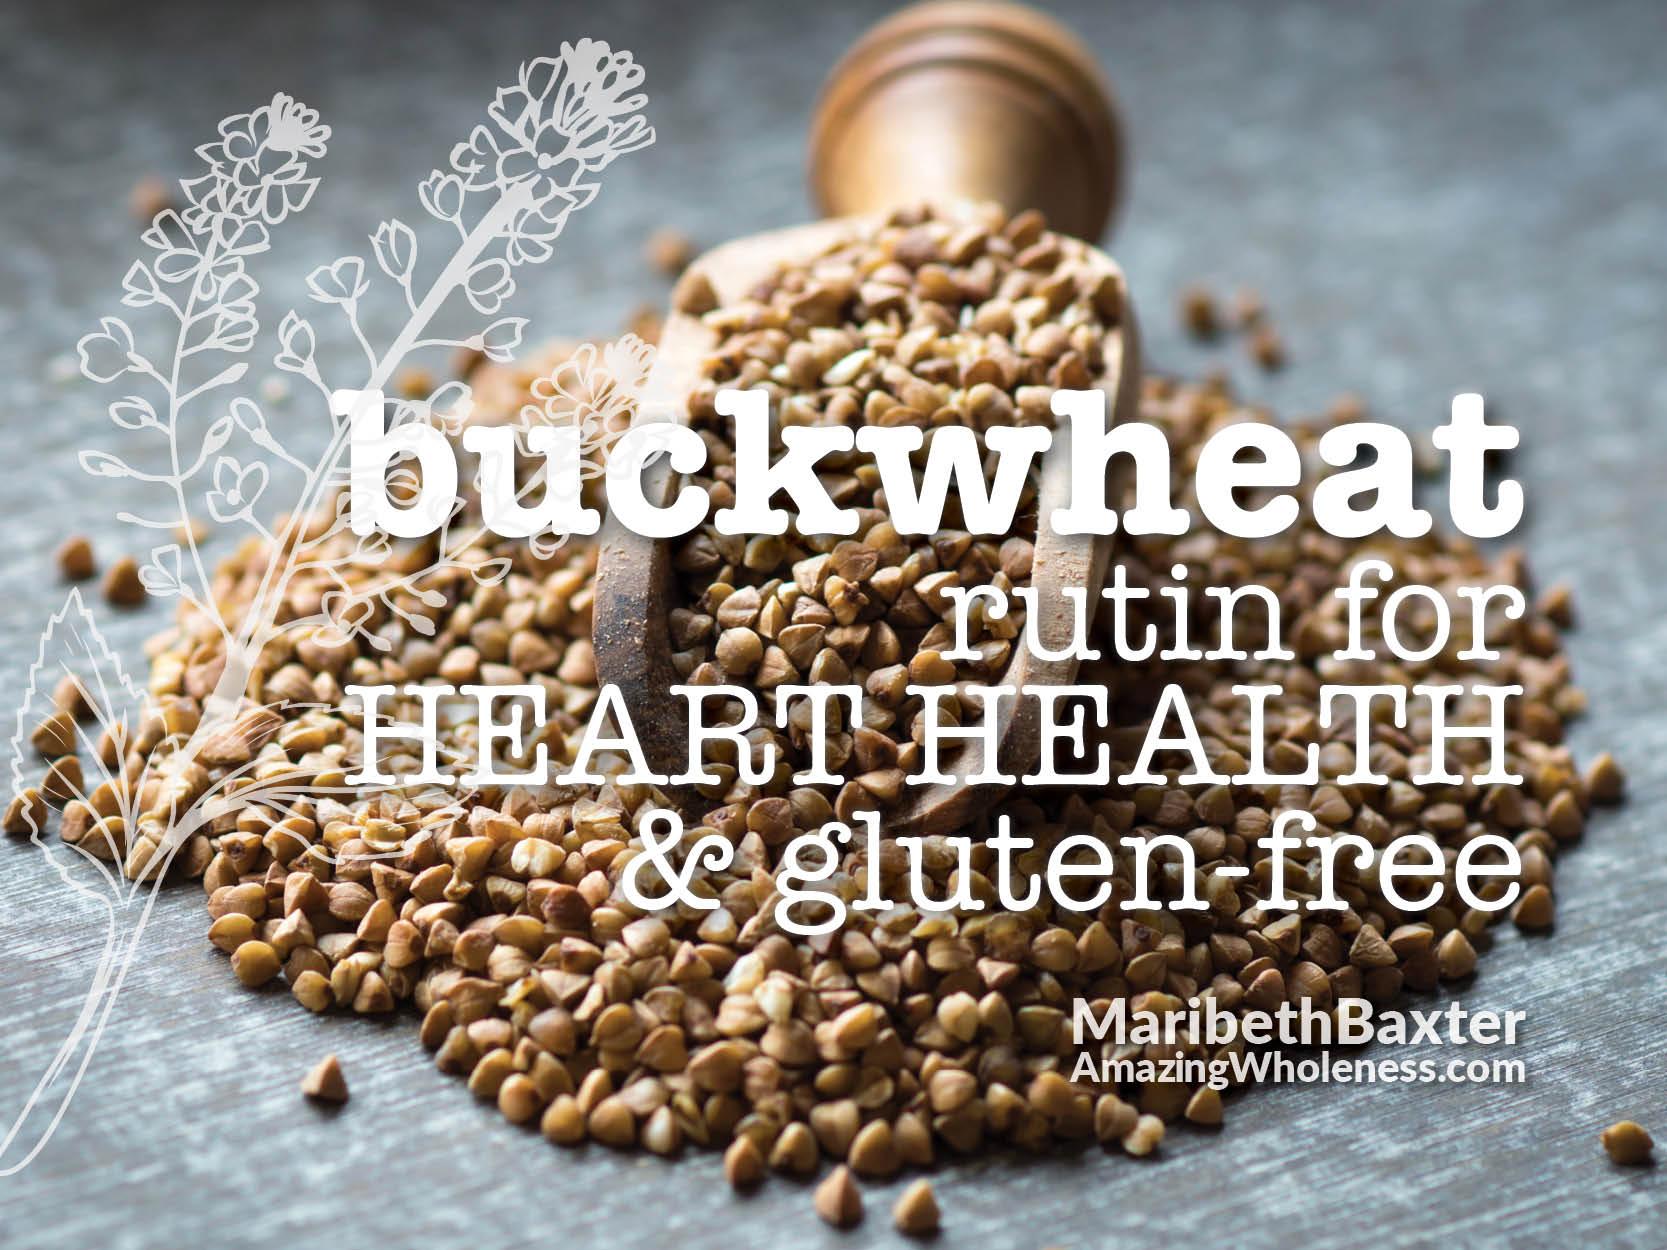 Buckwheat - Rutin for heart health & gluten-free